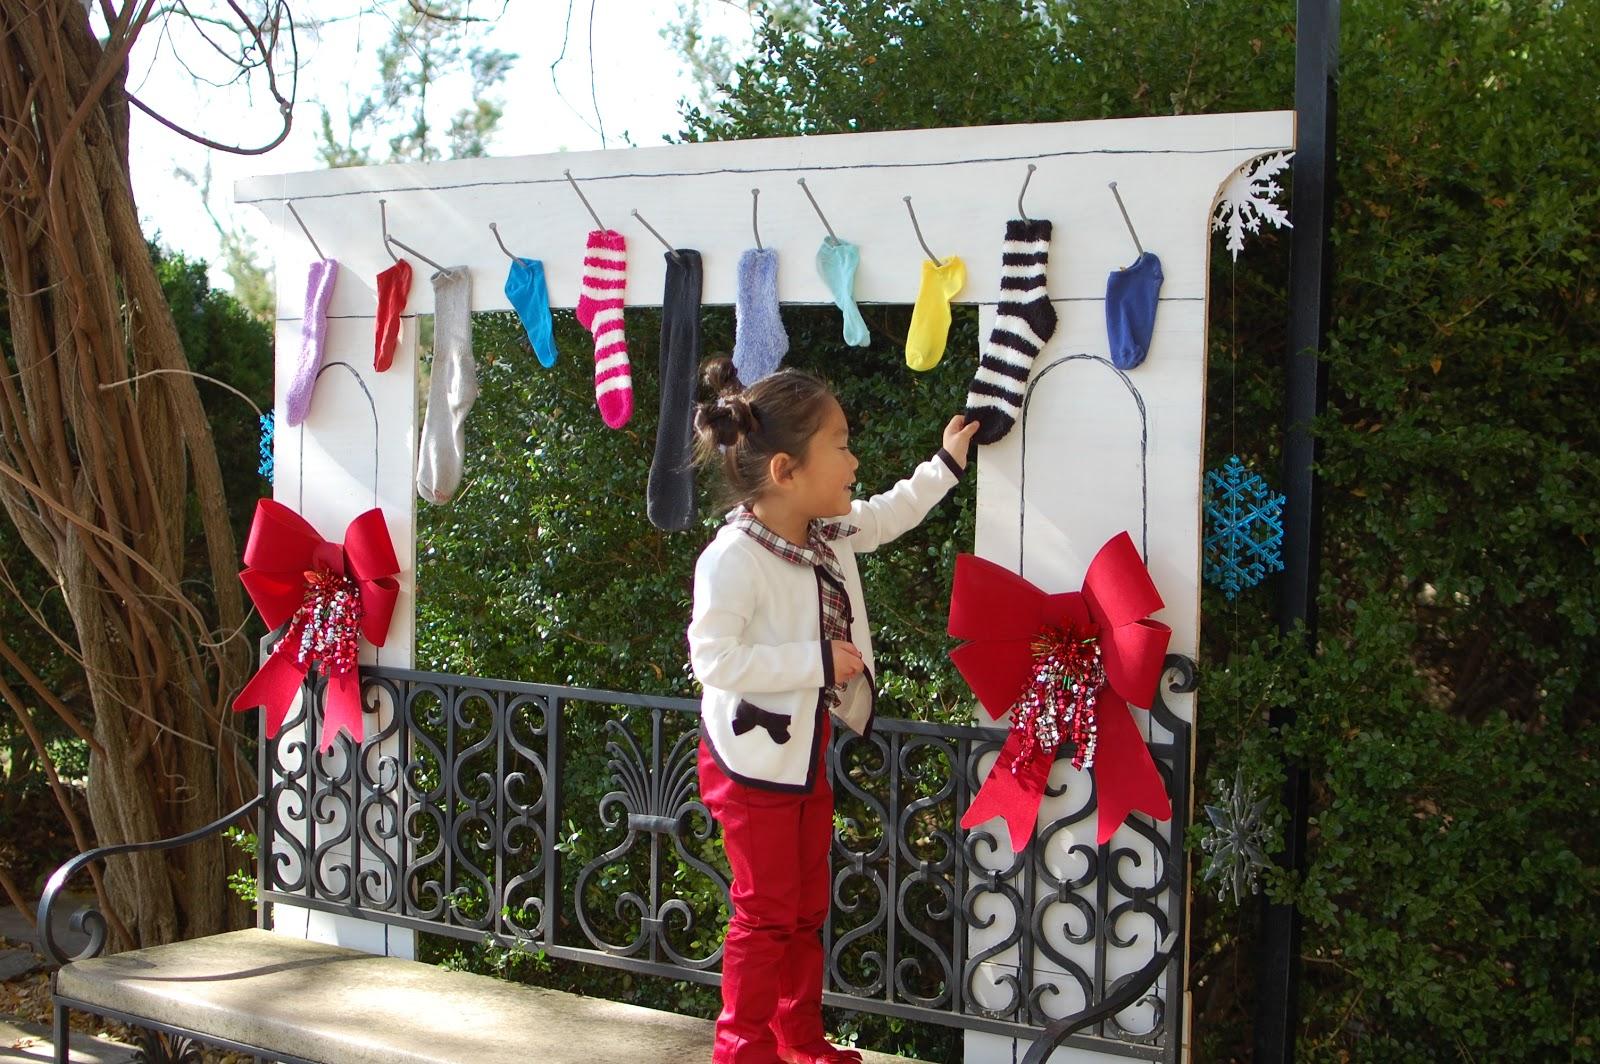 My Amazeing Journey: Christmas At Cheekwood